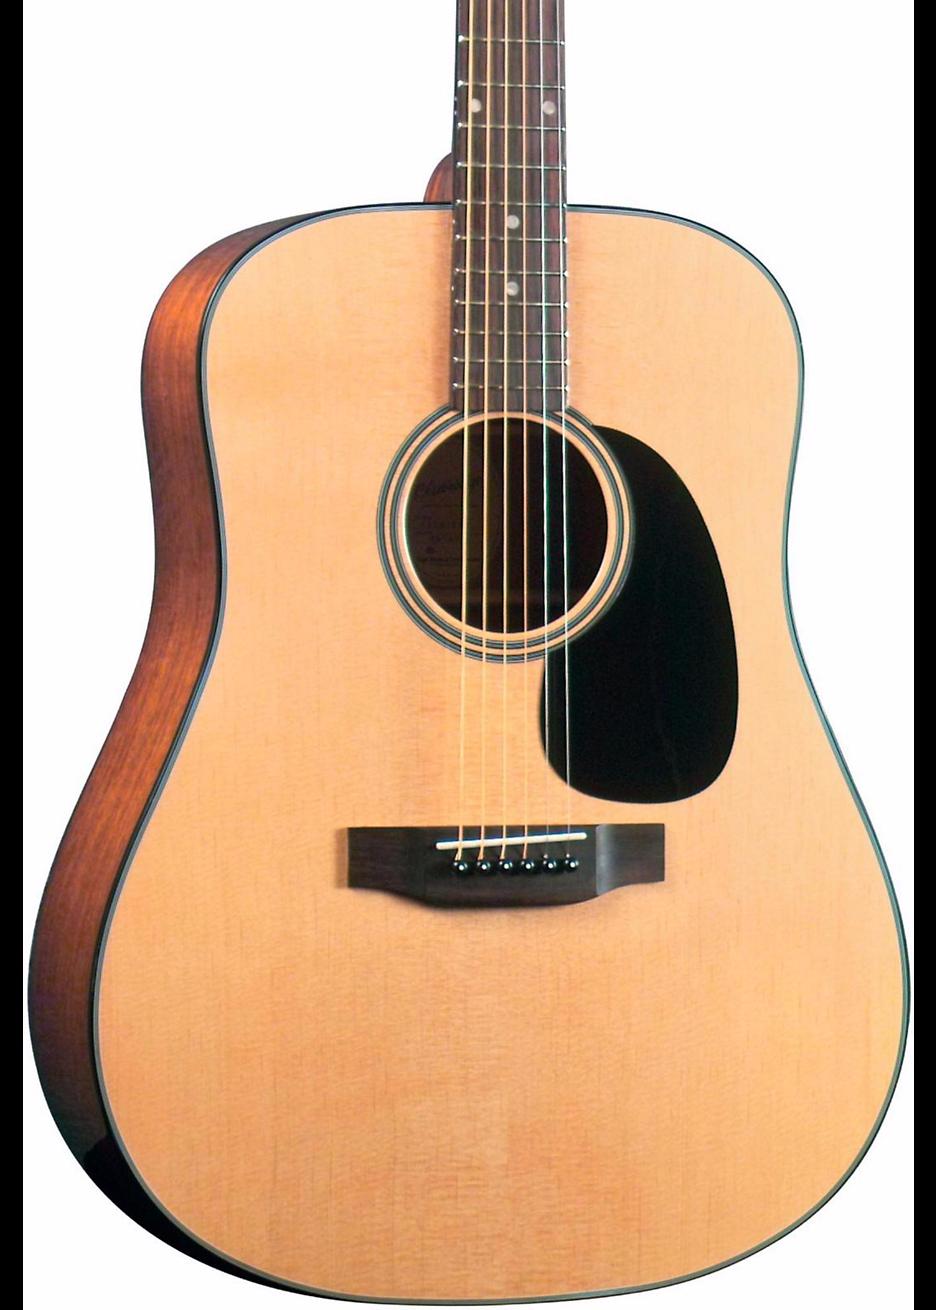 Blueridge BR40 Contemporary Series Dreadnought Guitar Natural by Blueridge